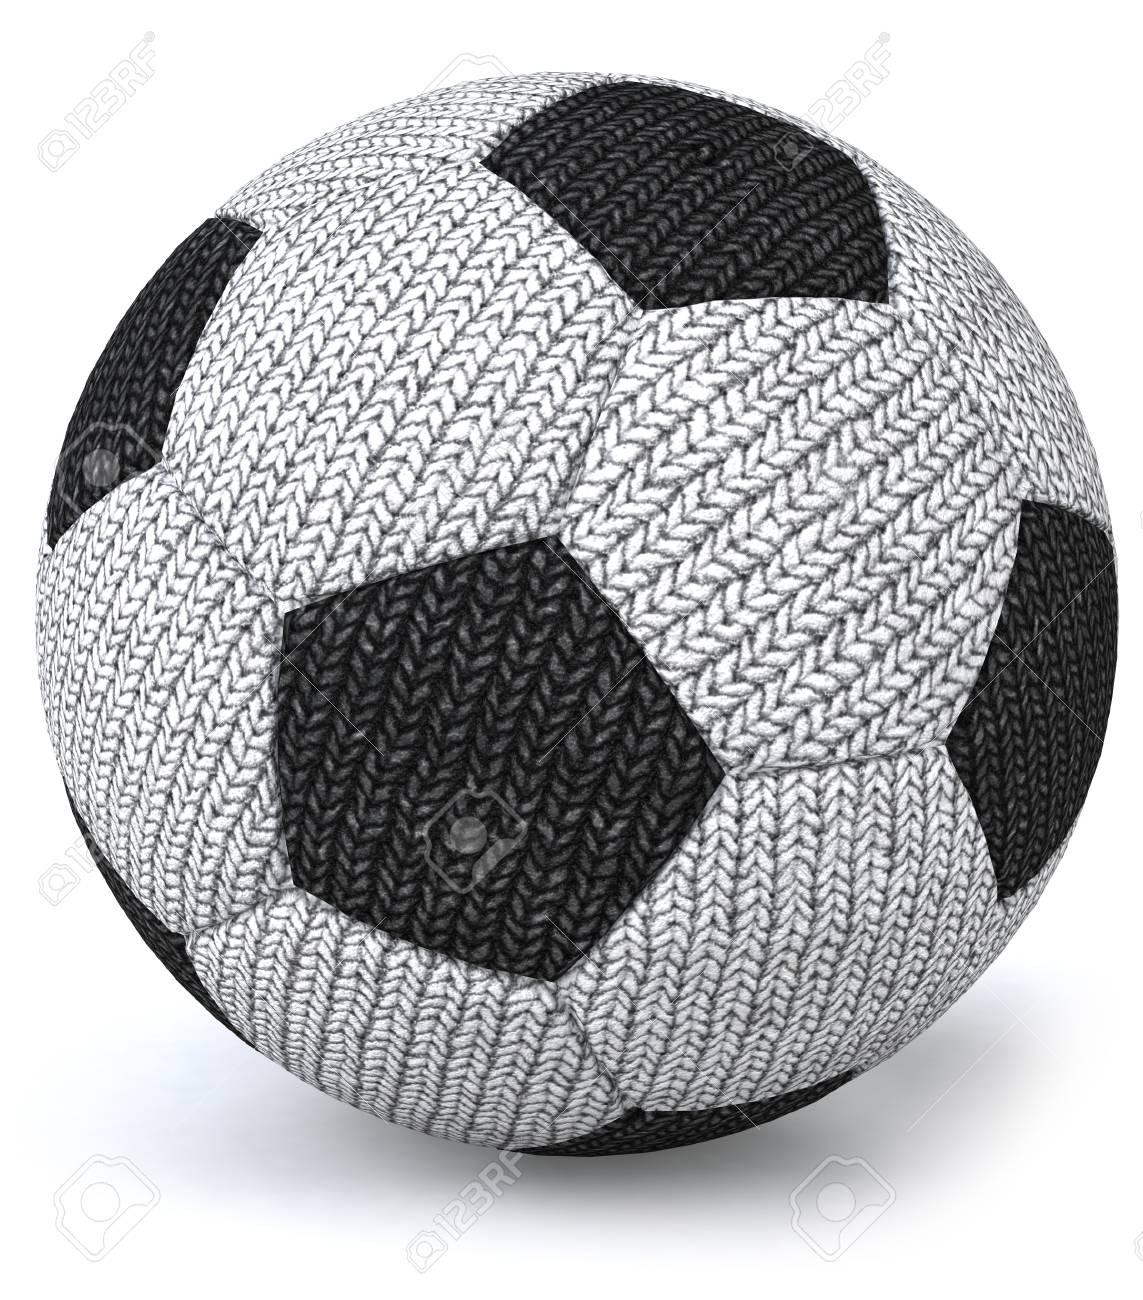 98474c190bd Cartoon knitted soccer ball Stock Photo - 82868812